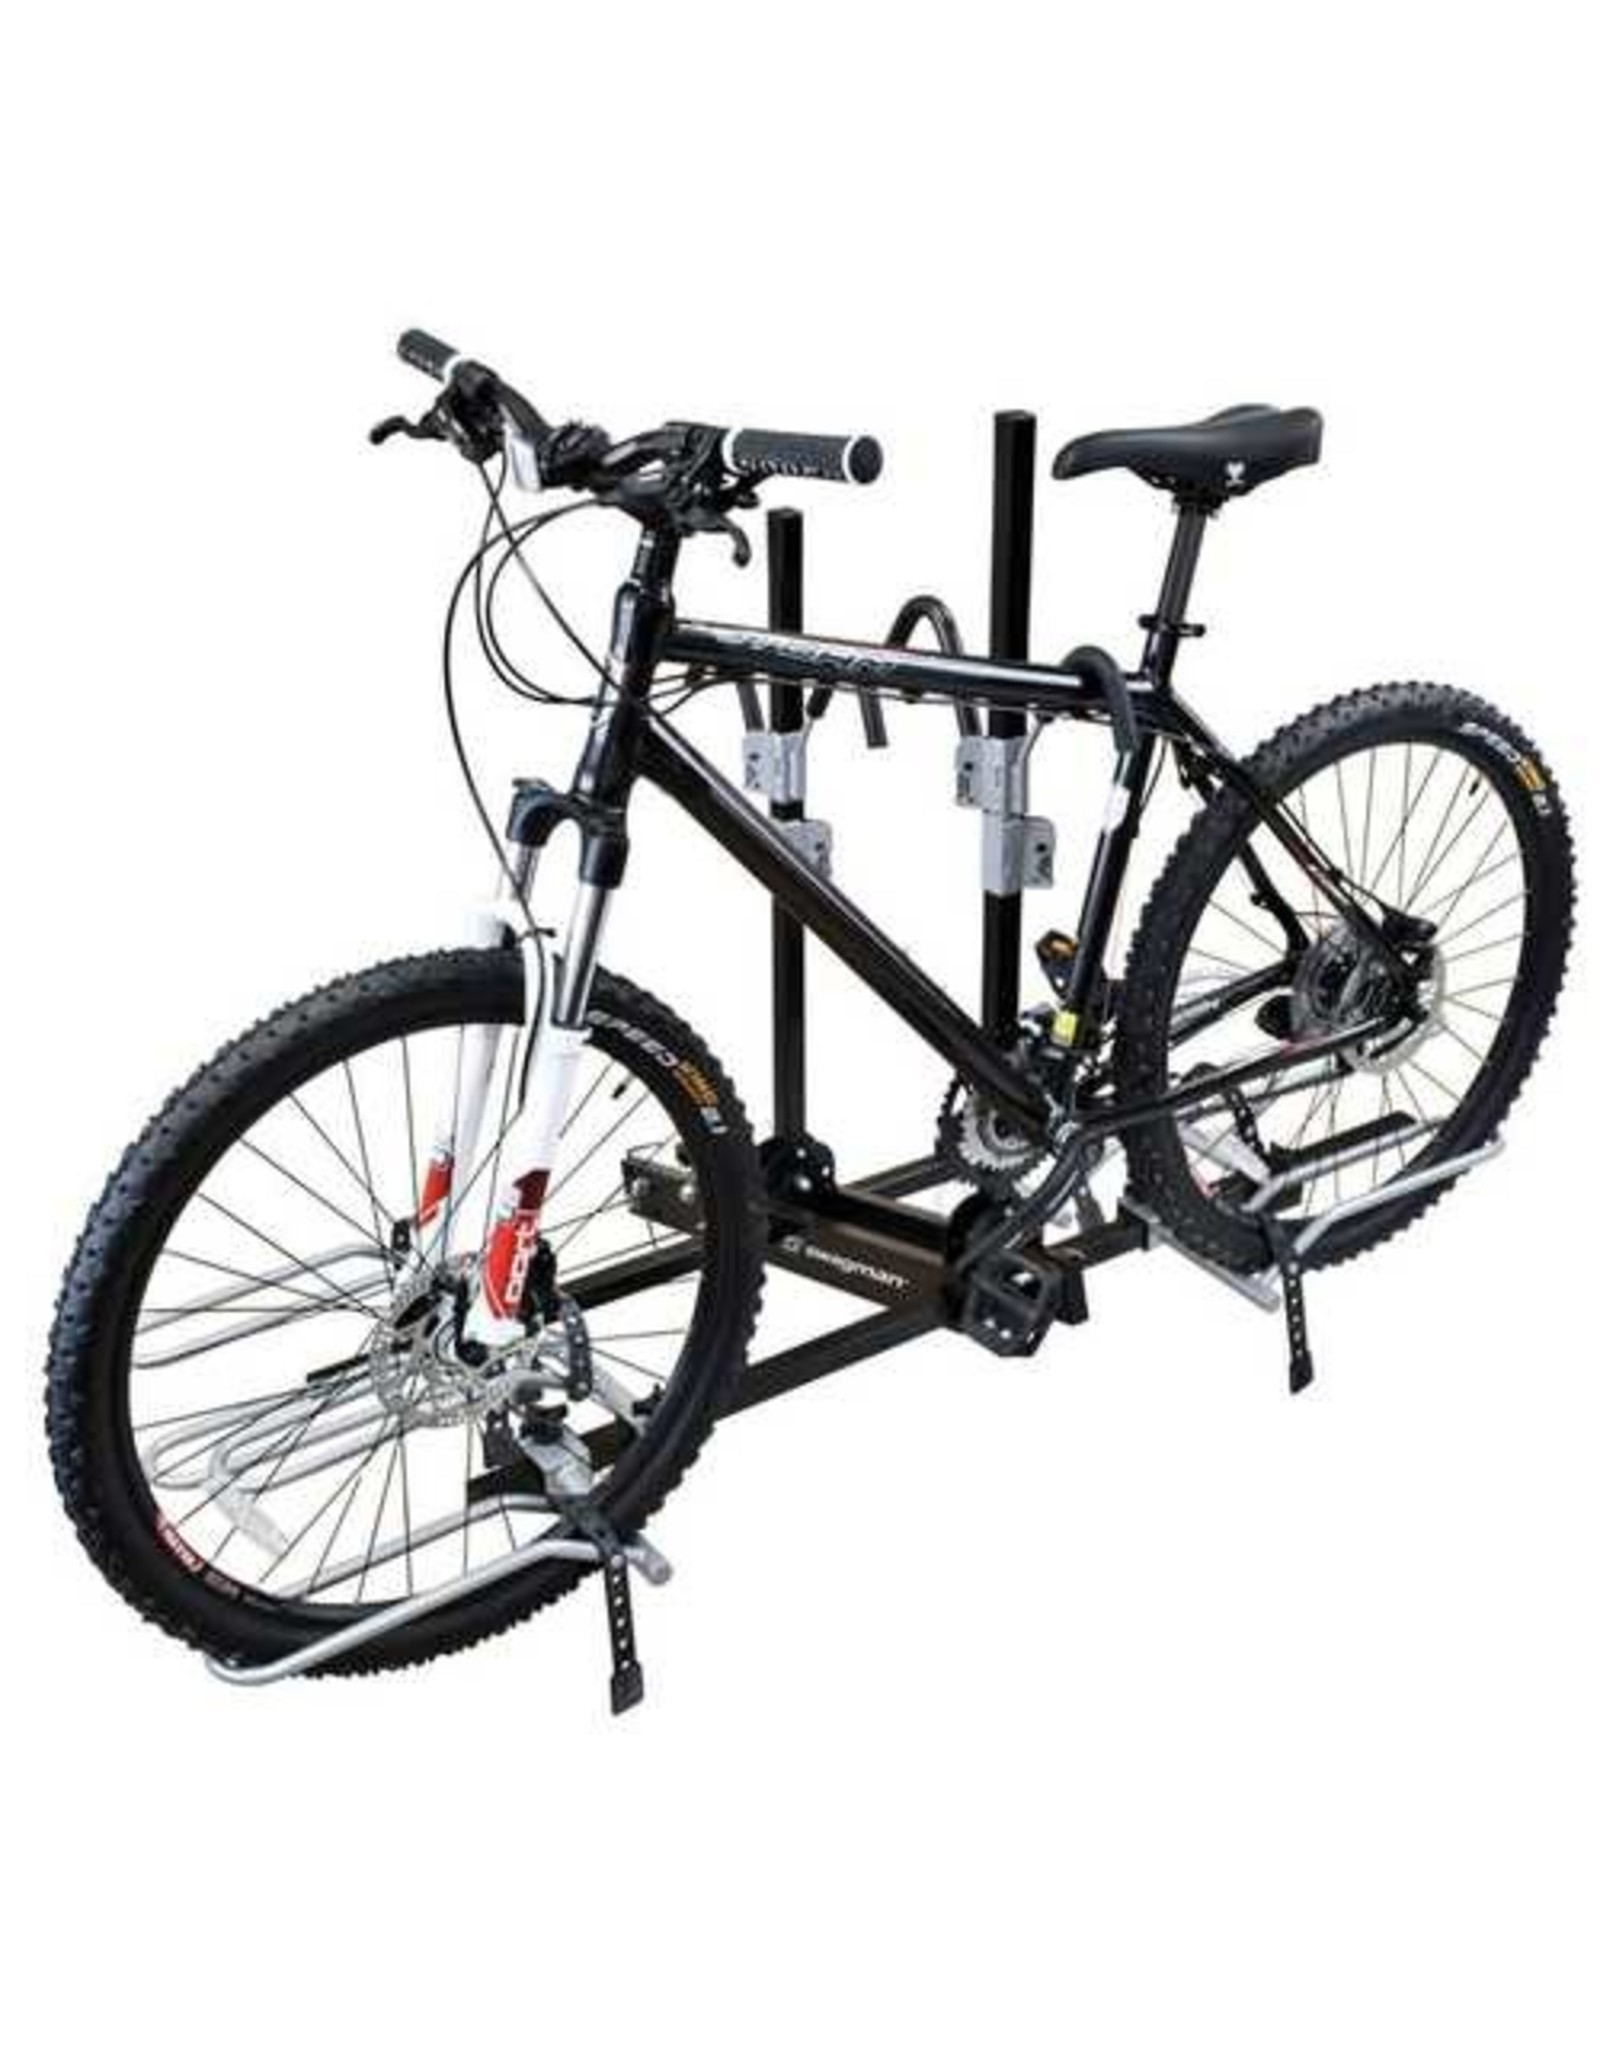 Swagman Support vélo Swagman XTC 4